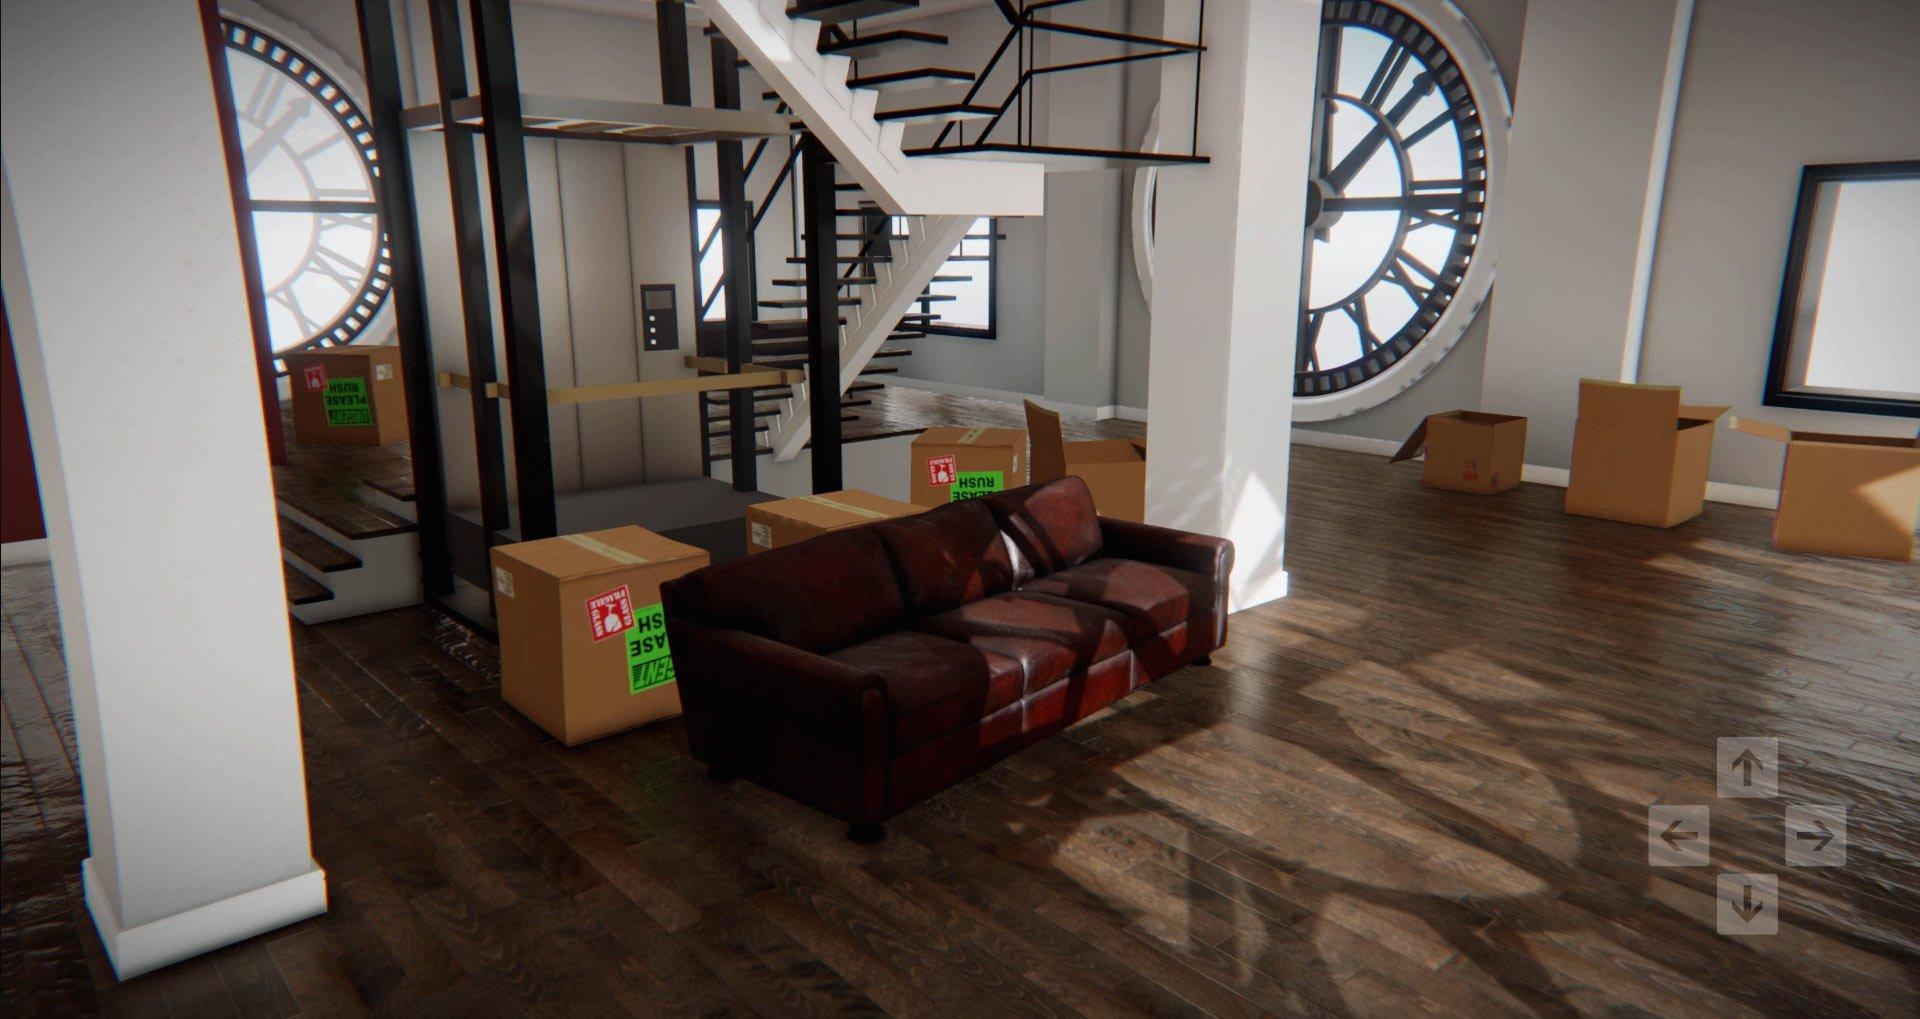 autodesk-stingray-oculus-rift-game-engine-virtual-reality-1